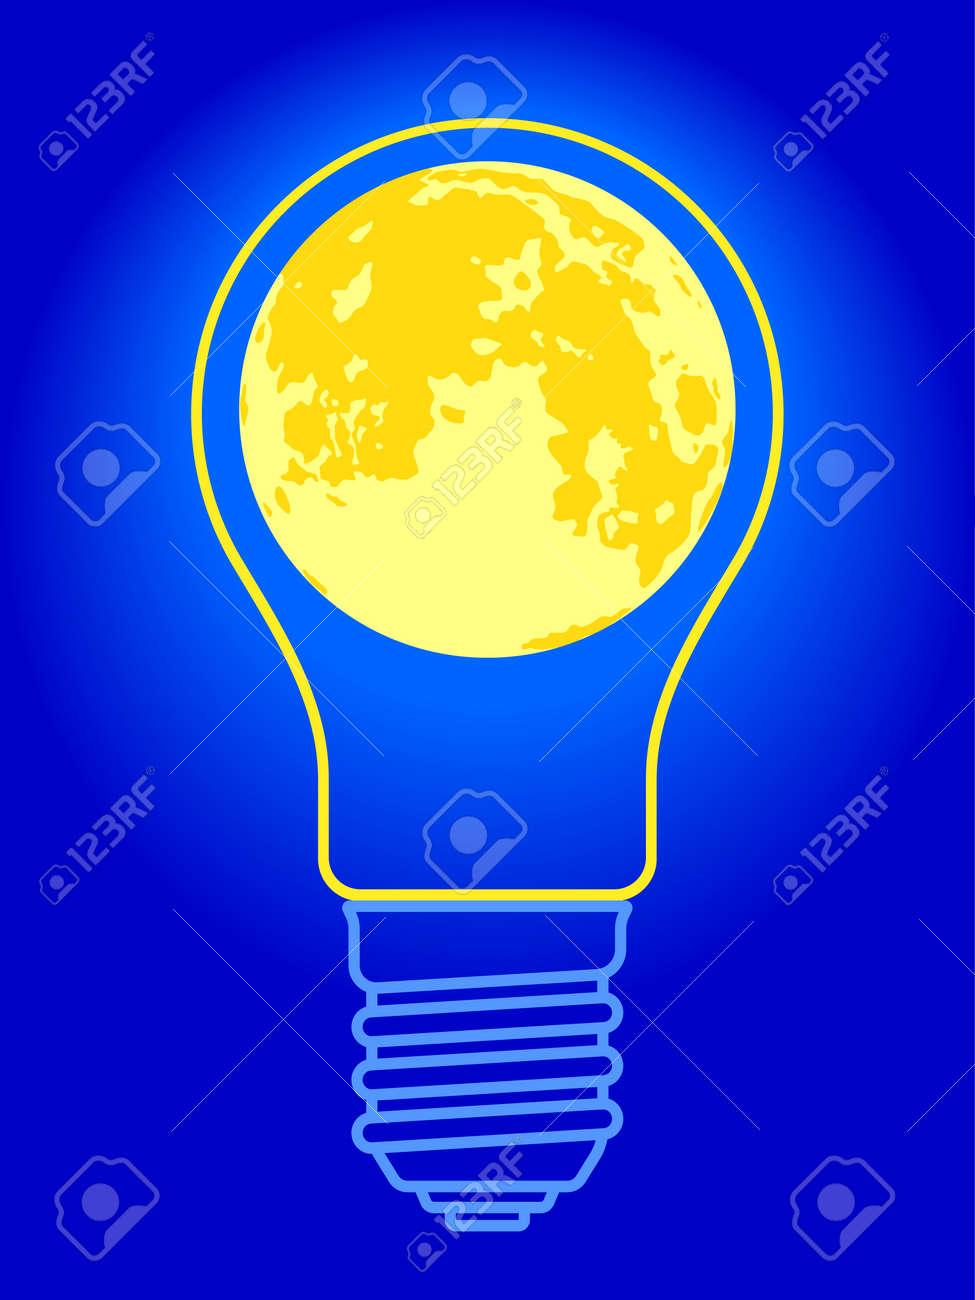 illustration of the abstract light bulb and full moon ロイヤリティ